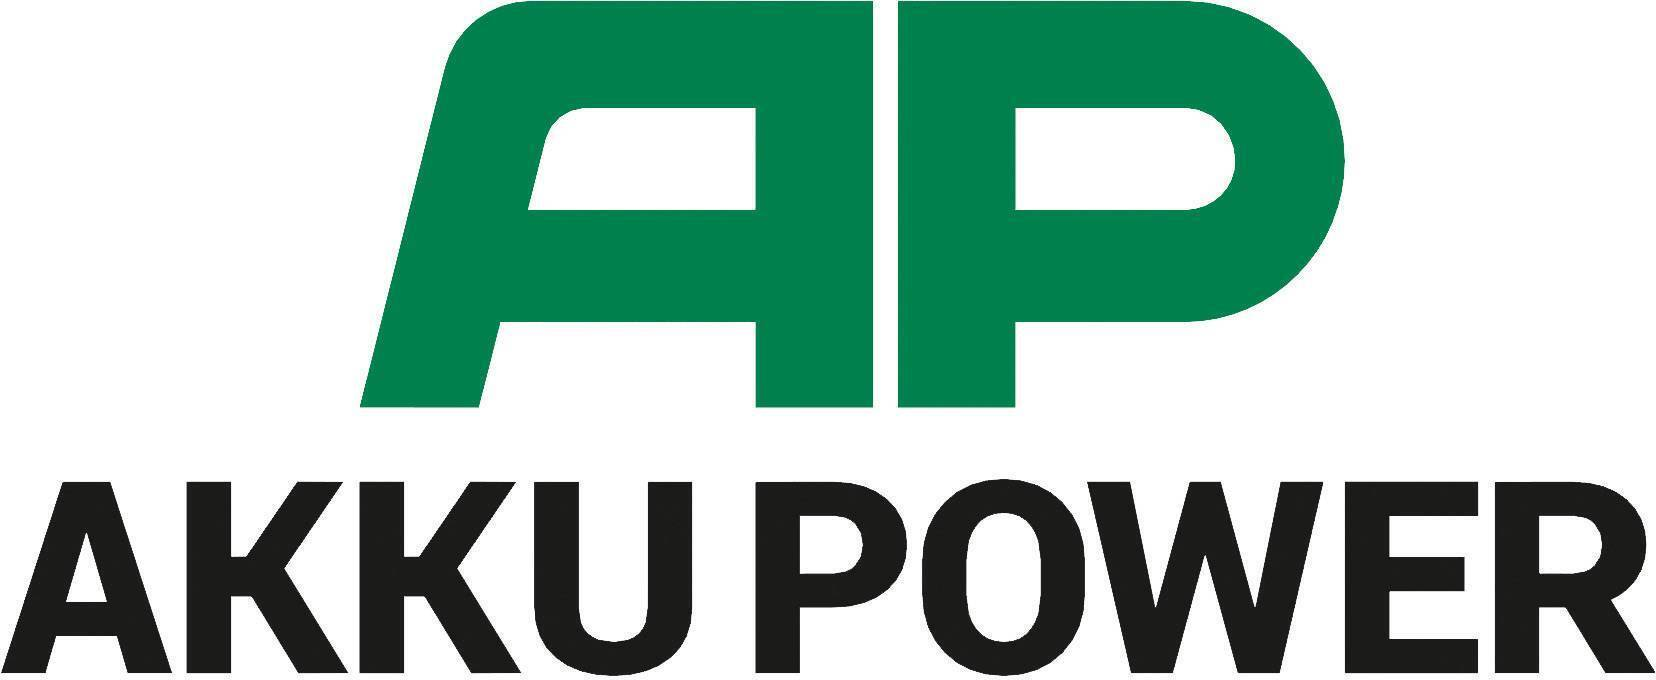 logo-marque-akkupower